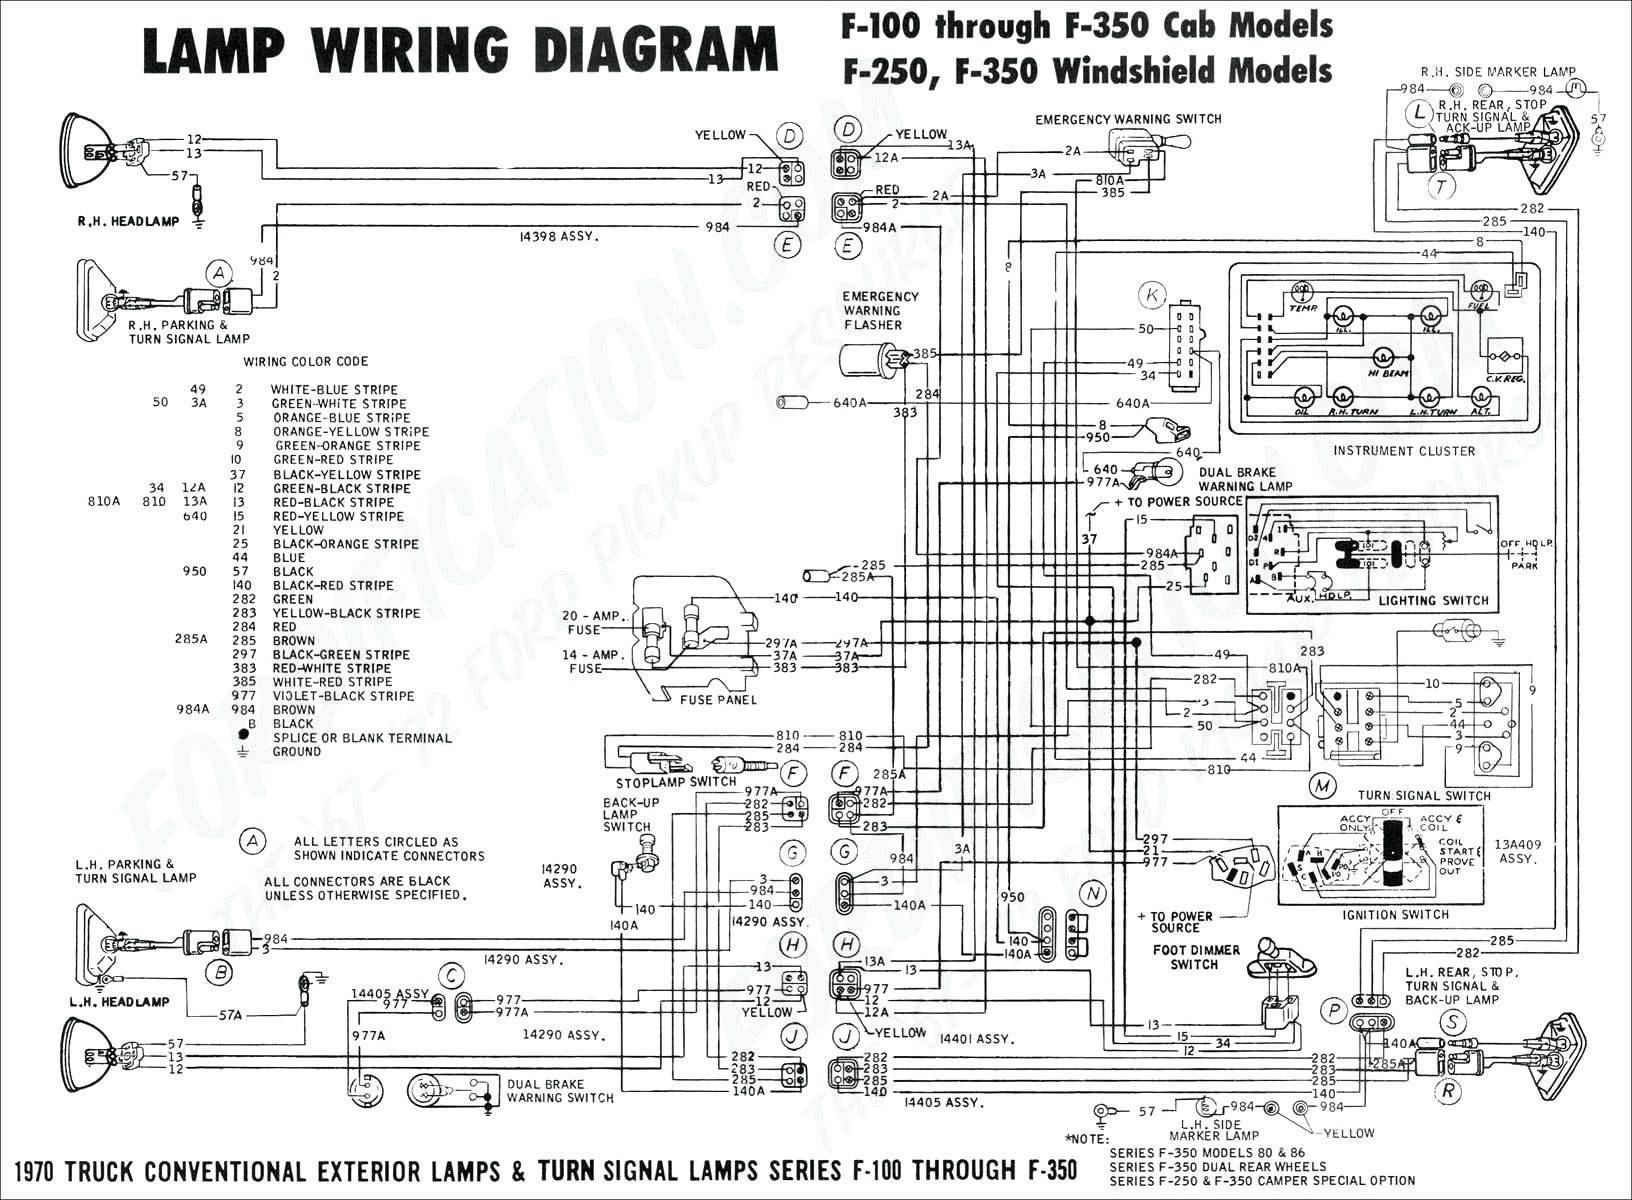 1996 Ford F 250 Powerstroke Wiring Schematics Only Citroen Ds3 Diagram 2002 F250 Trailer Brake Controller Custom Rh Littlewaves Co